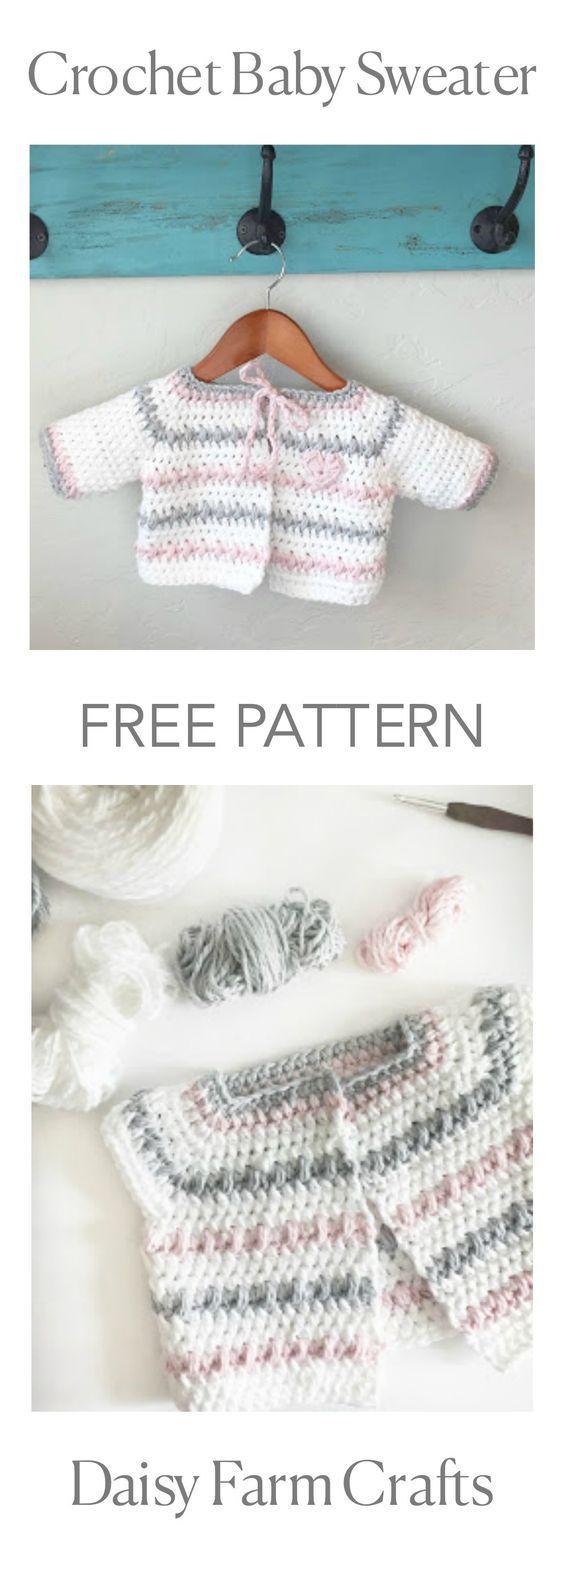 FREE PATTERN - Crochet Baby Sweater | crotchet | Pinterest | Saco de ...